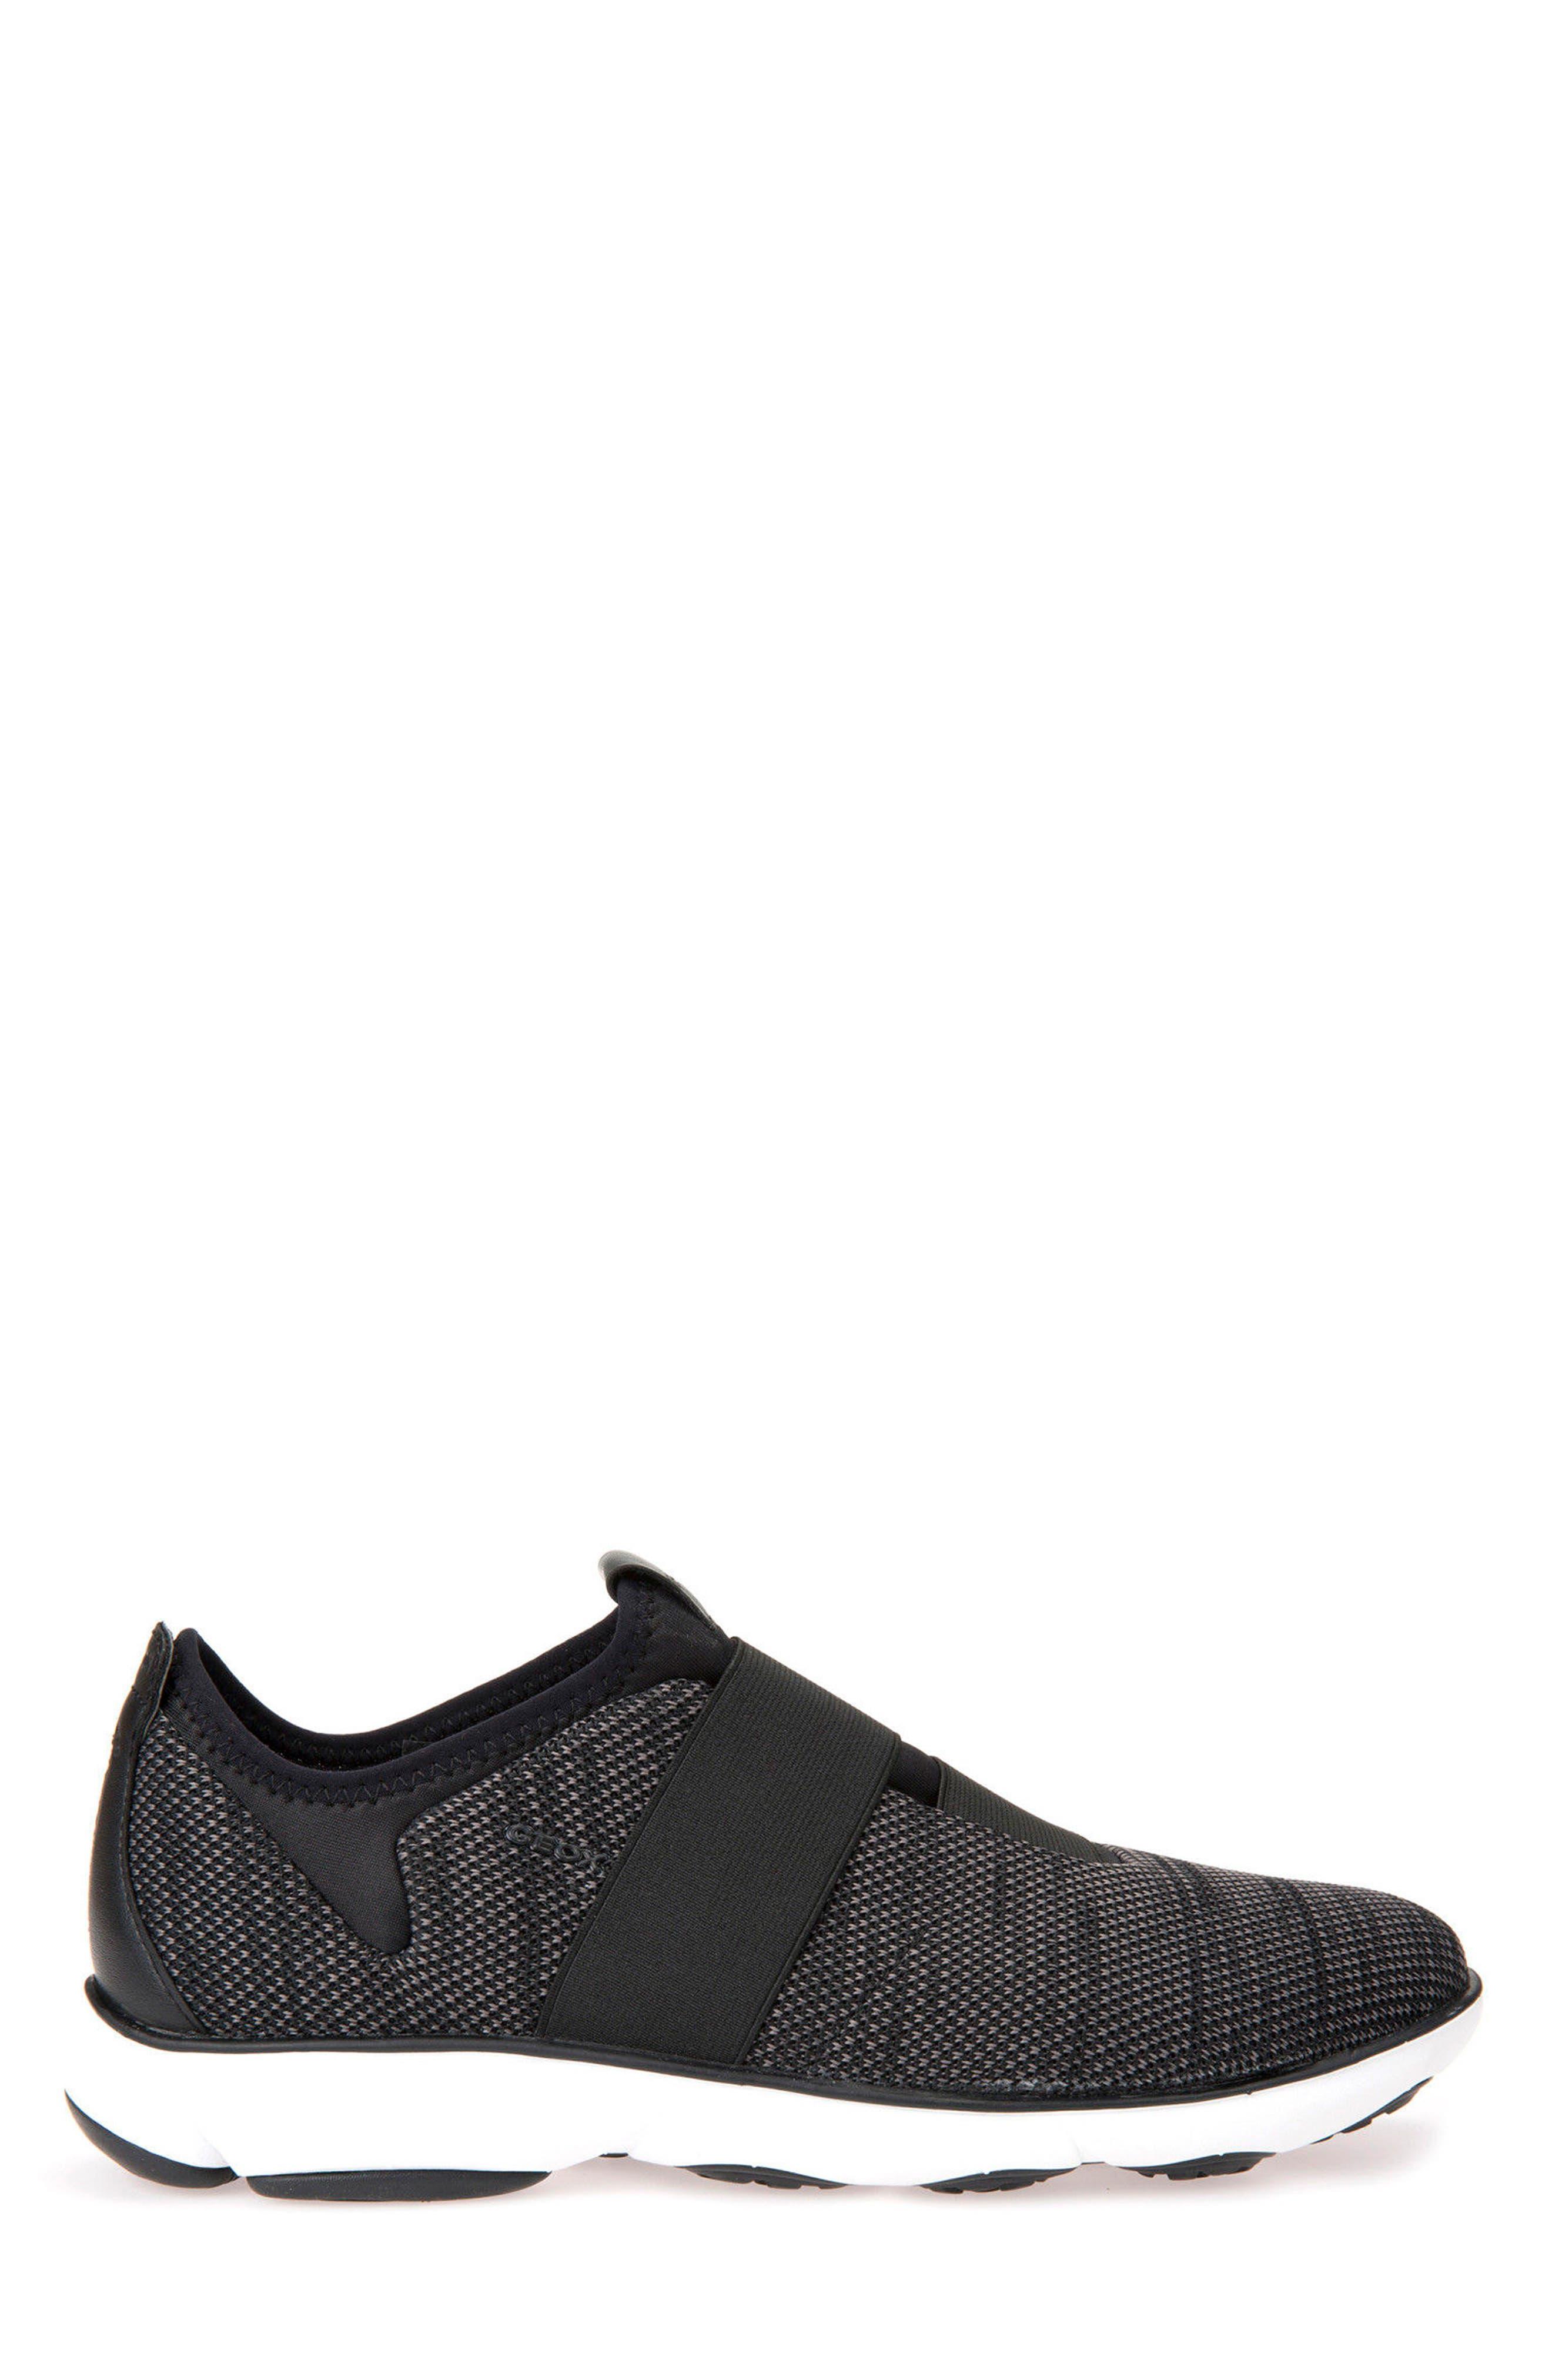 GEOX Nebula 45 Banded Slip-On Sneaker, Main, color, BLACK